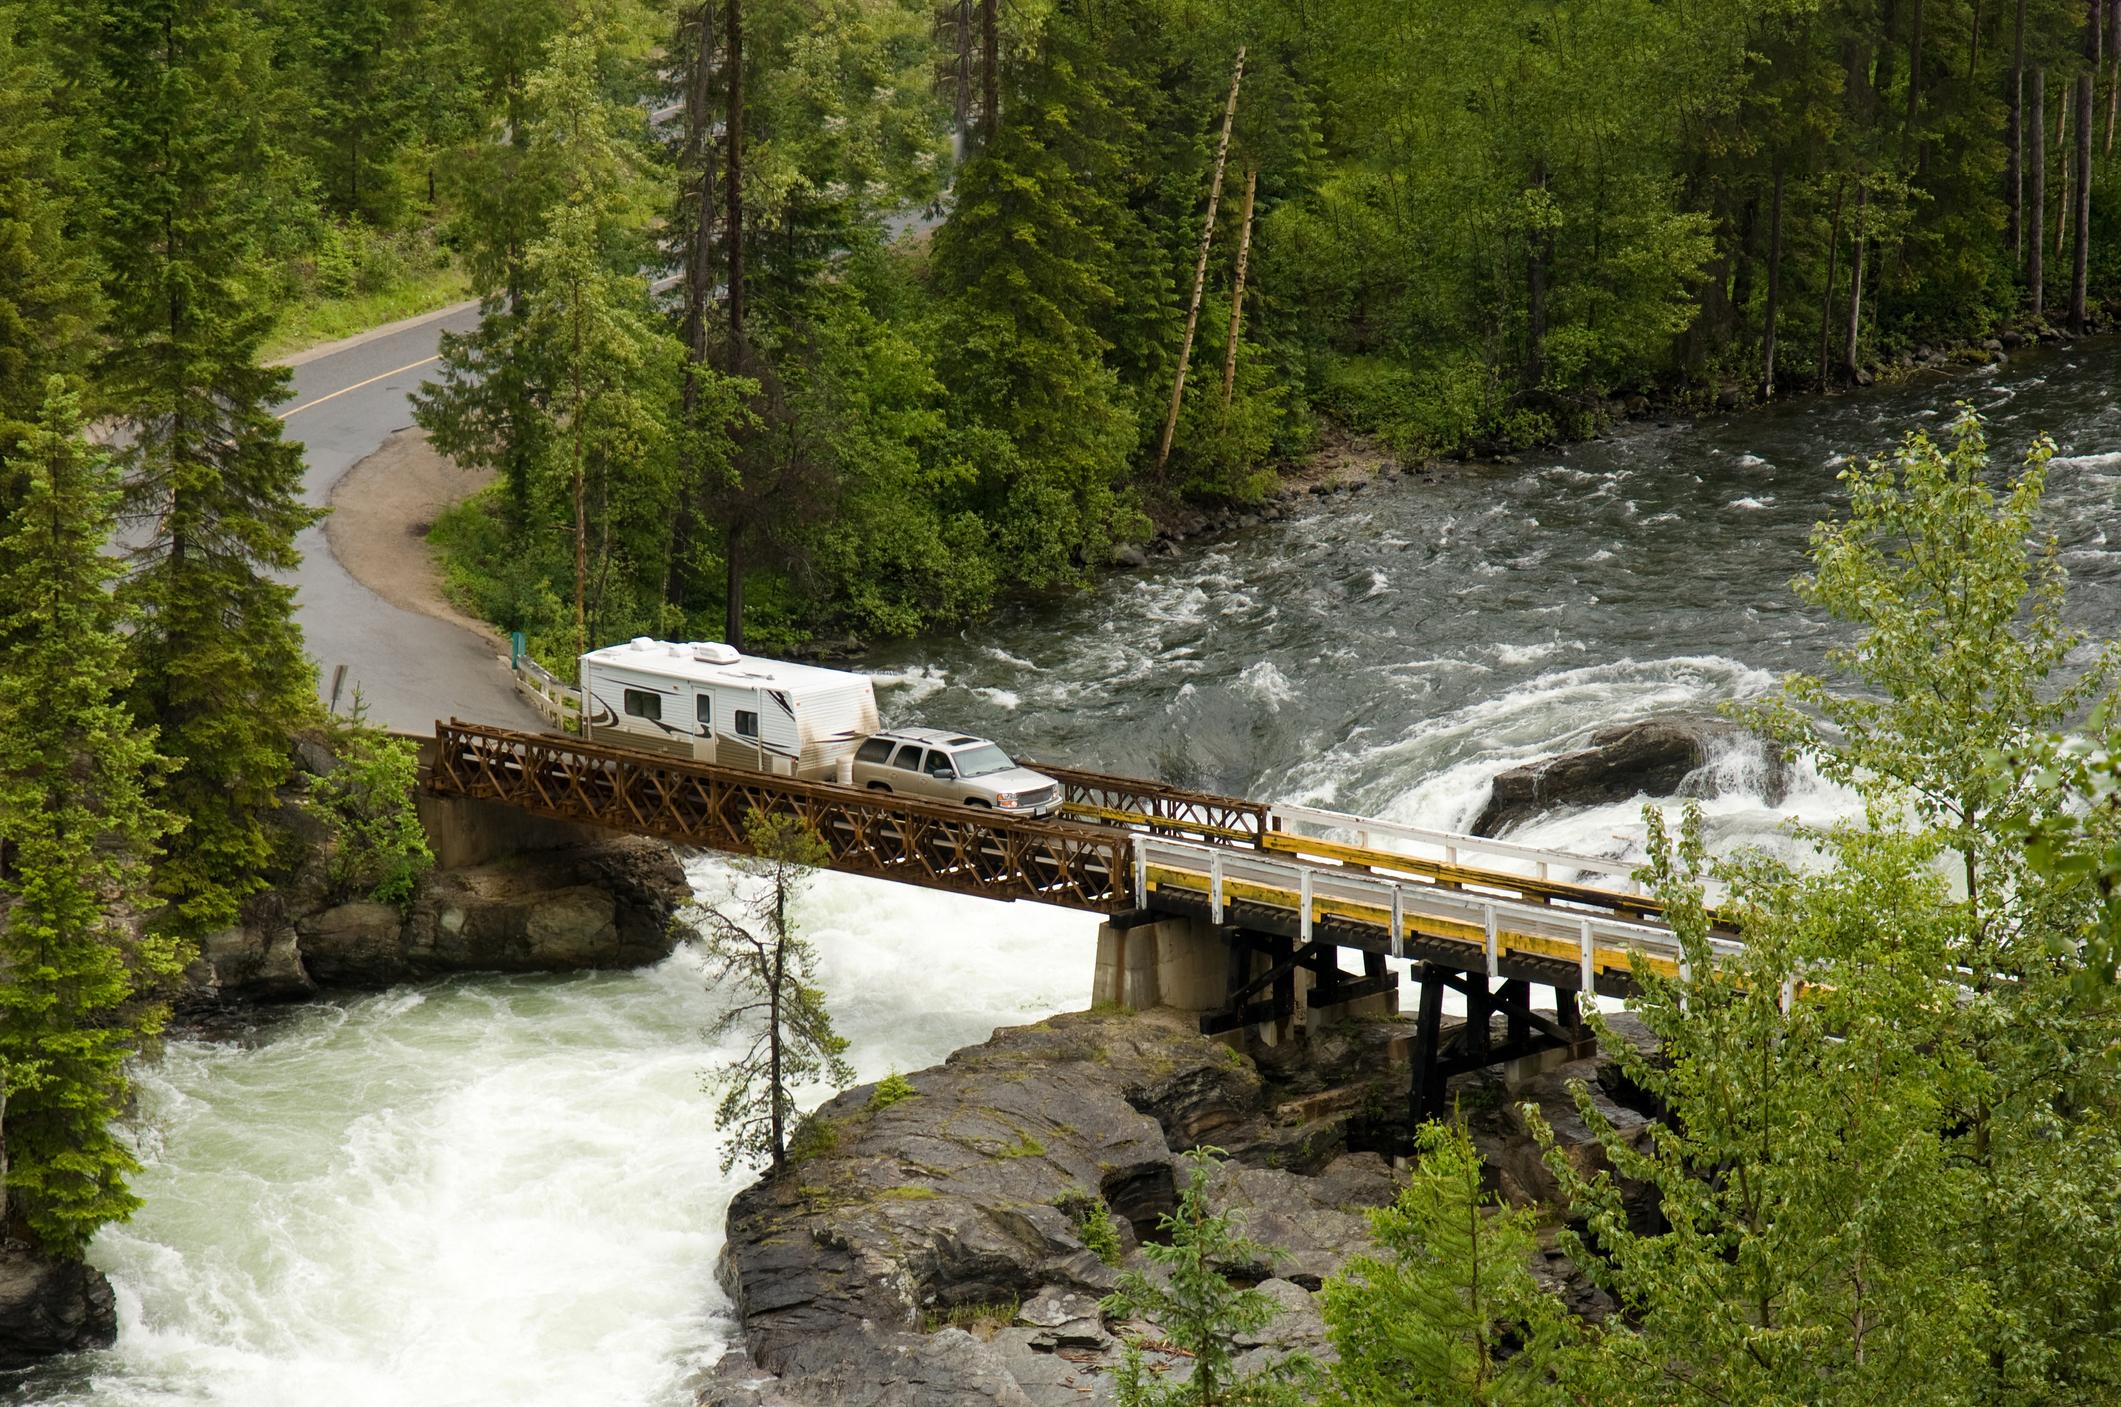 RV towing a fifth-wheel drives over a bridge